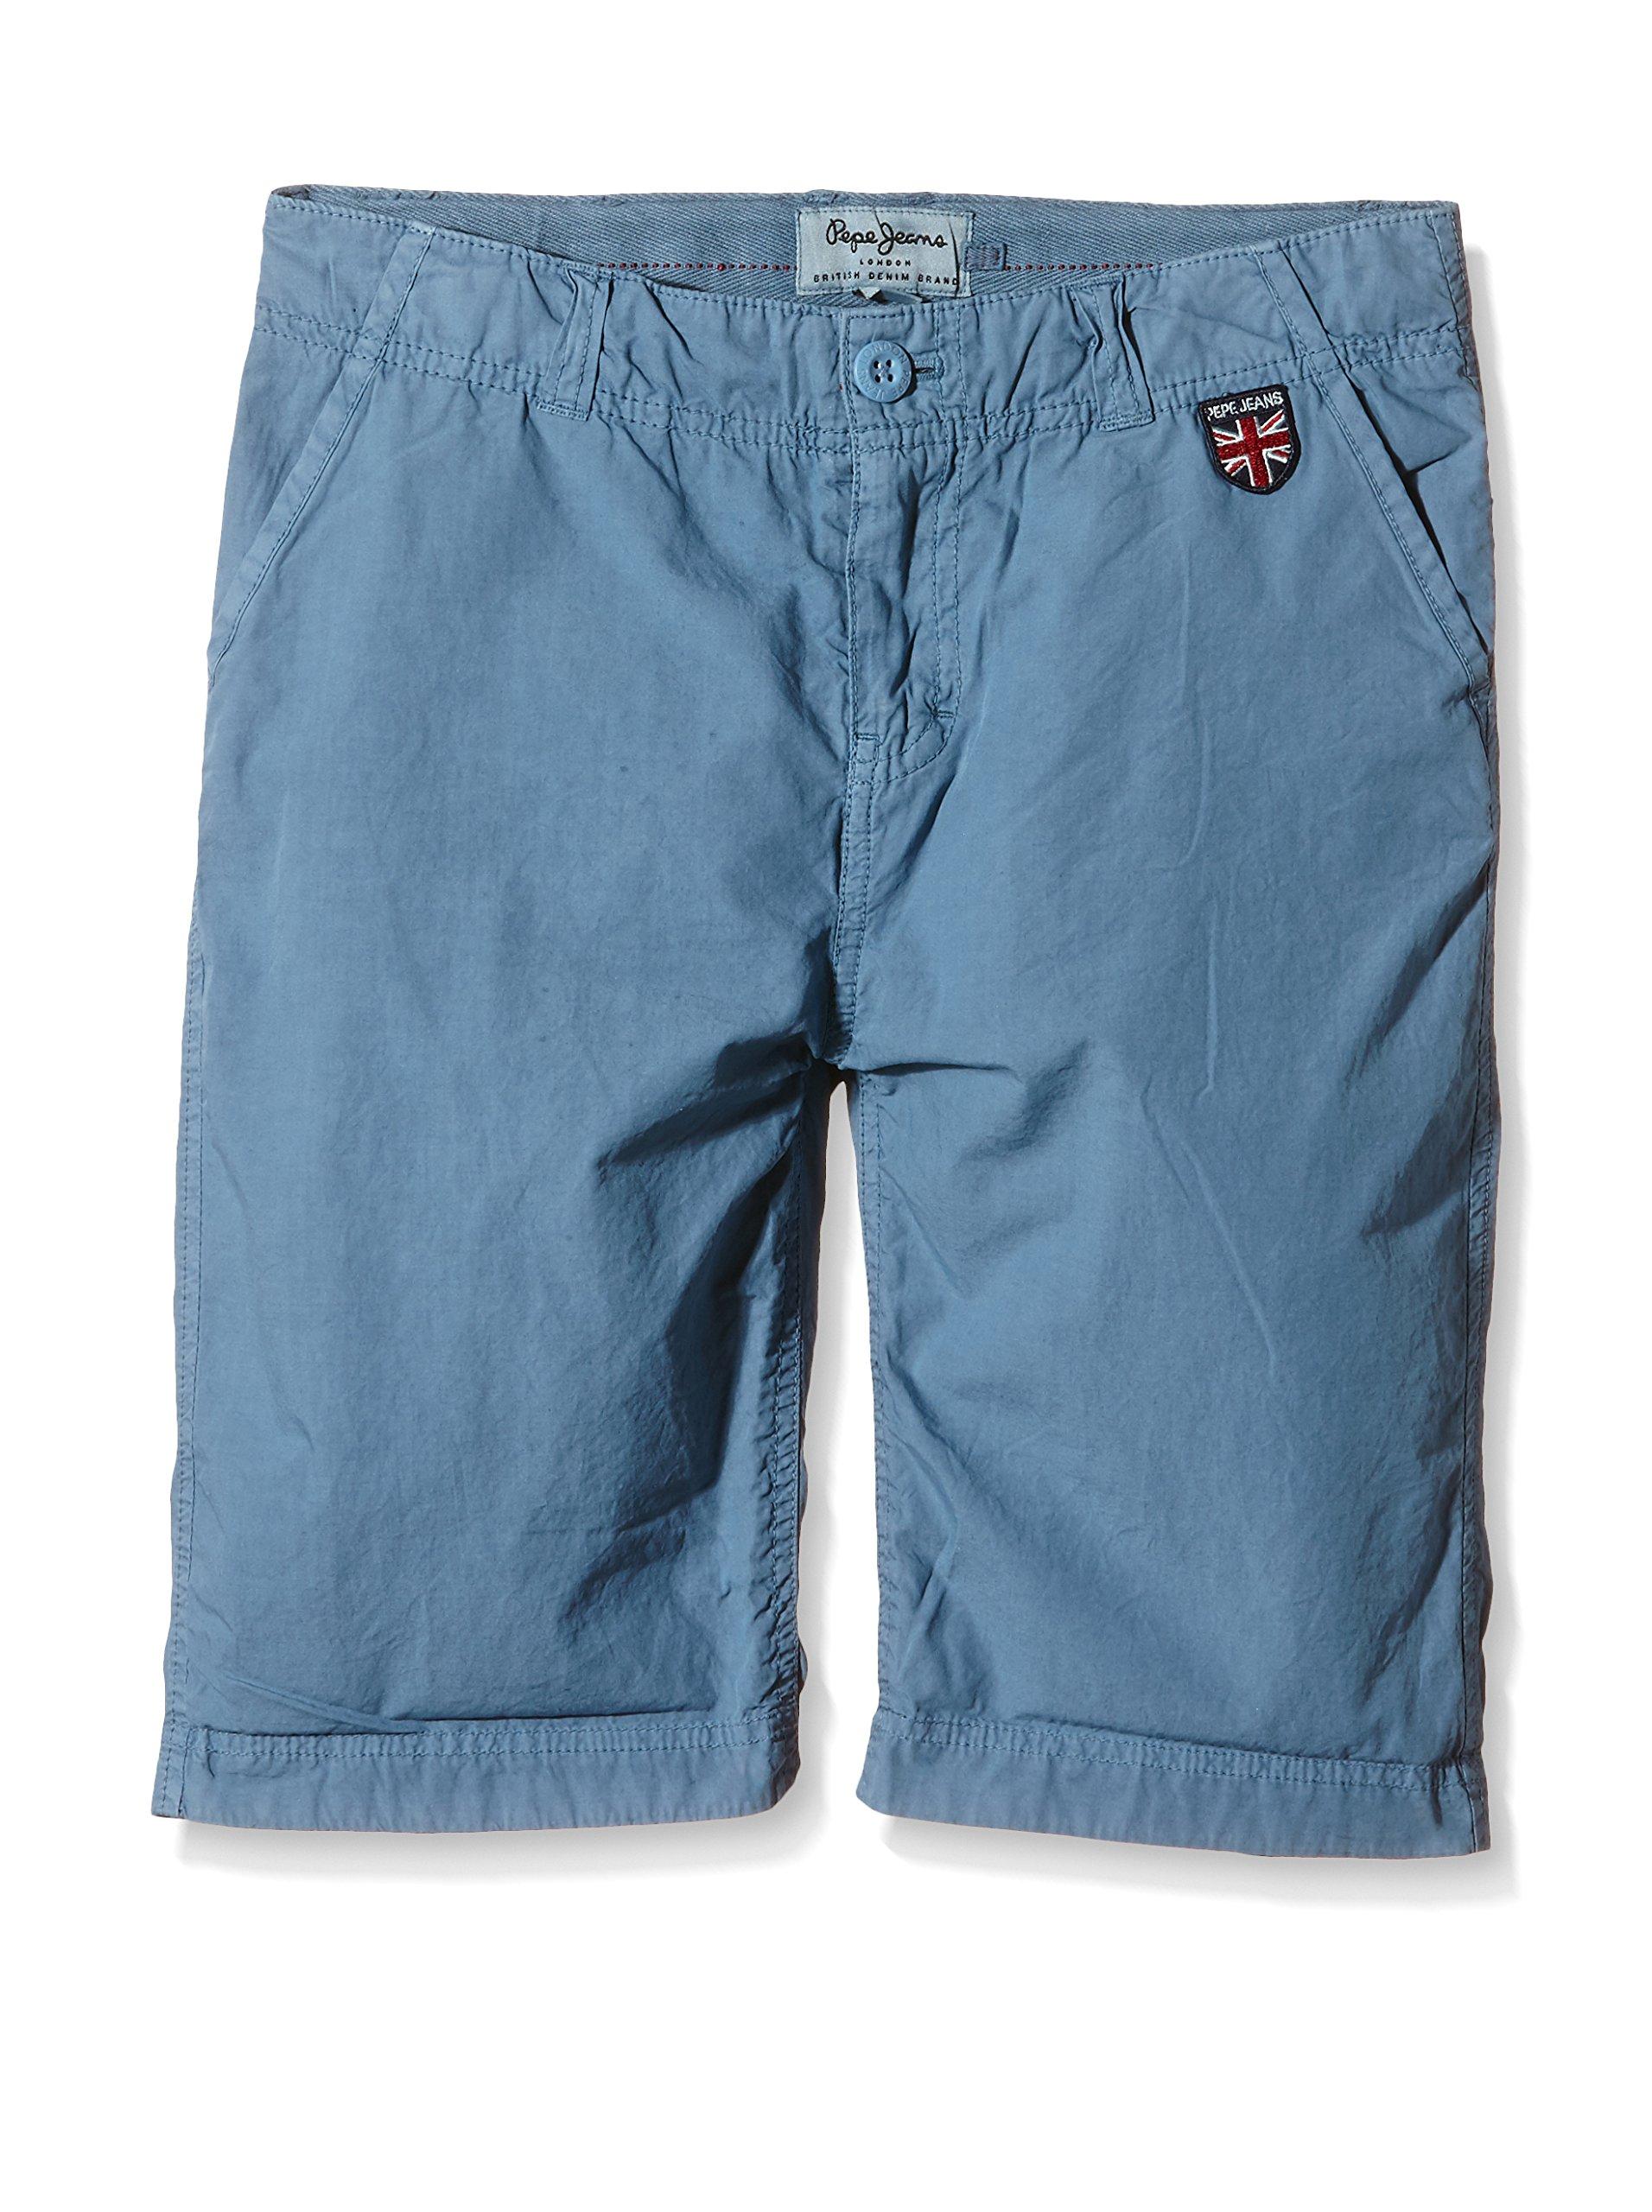 Pepe Jeans London Short Daves